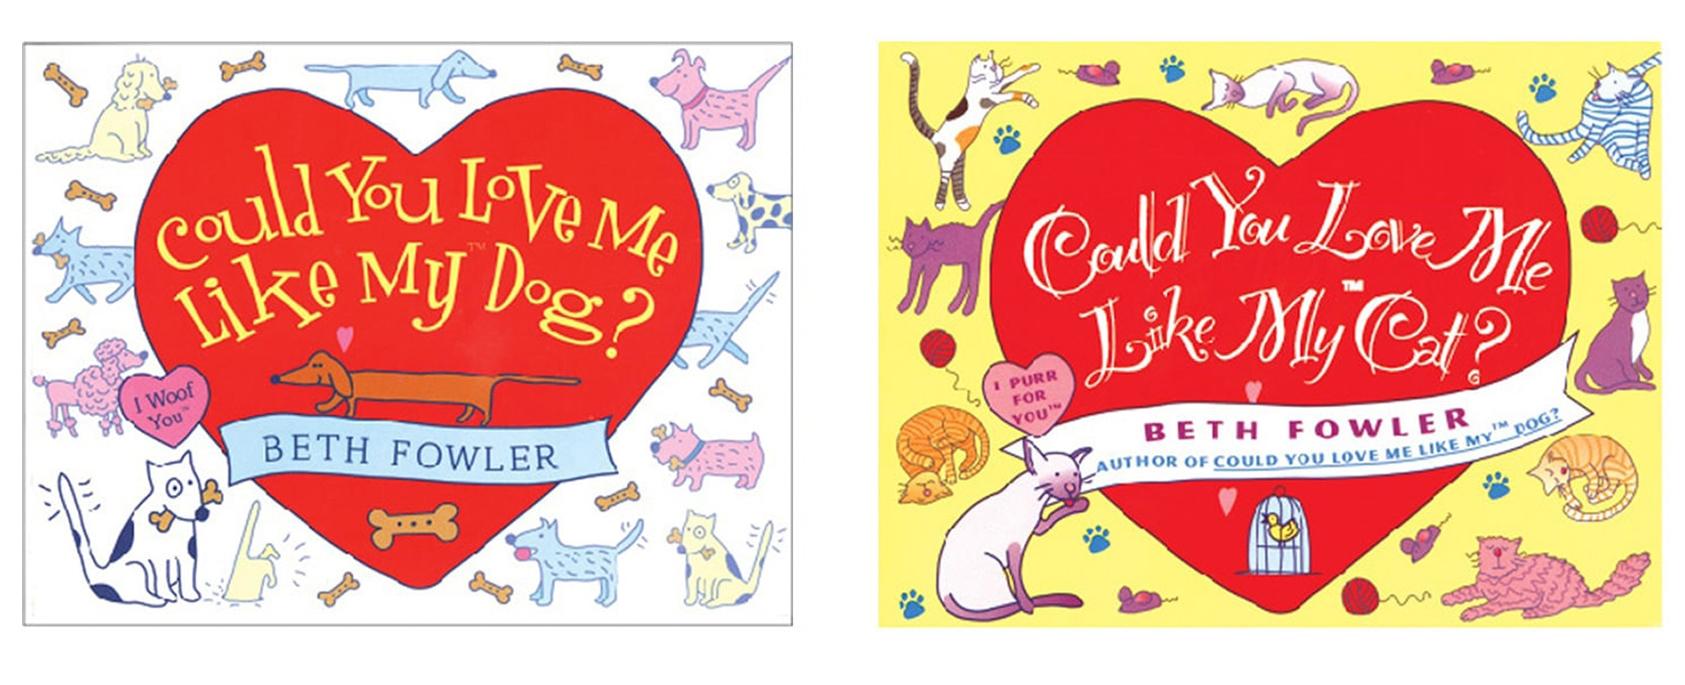 COULD YOU LOVE ME series—design & illustration / Fireside Books